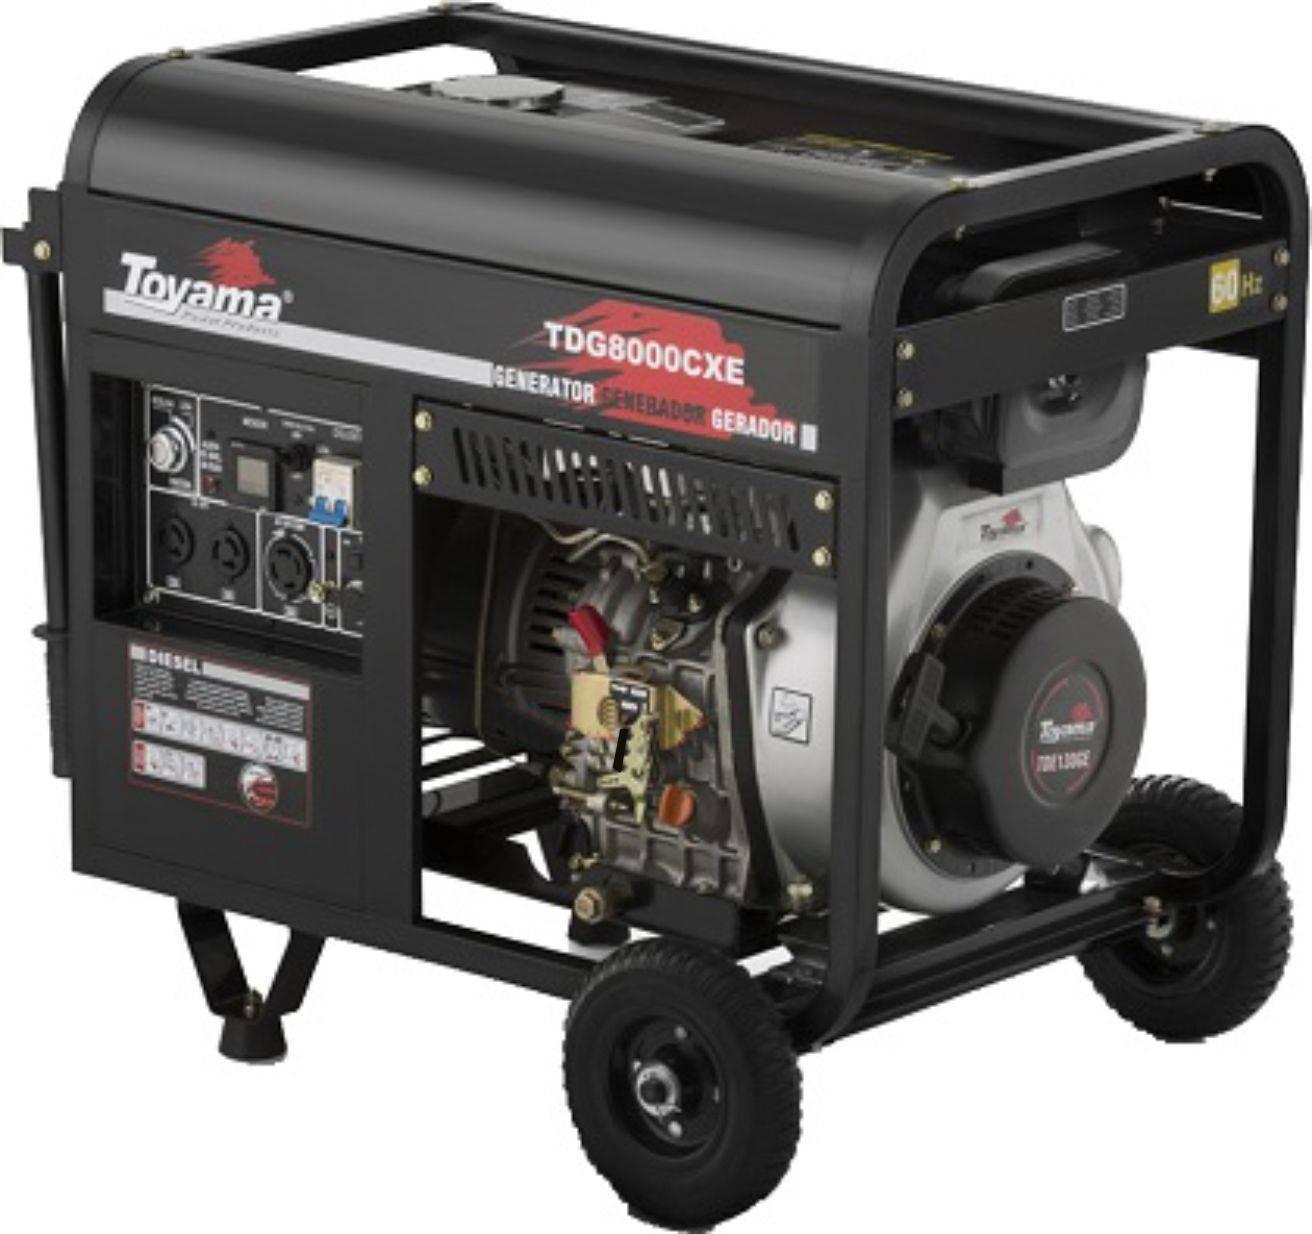 Gerador a Diesel Toyama TDG8000CXE Monof. 6,5 KVA, Em OFERTA - BSS Maquinas